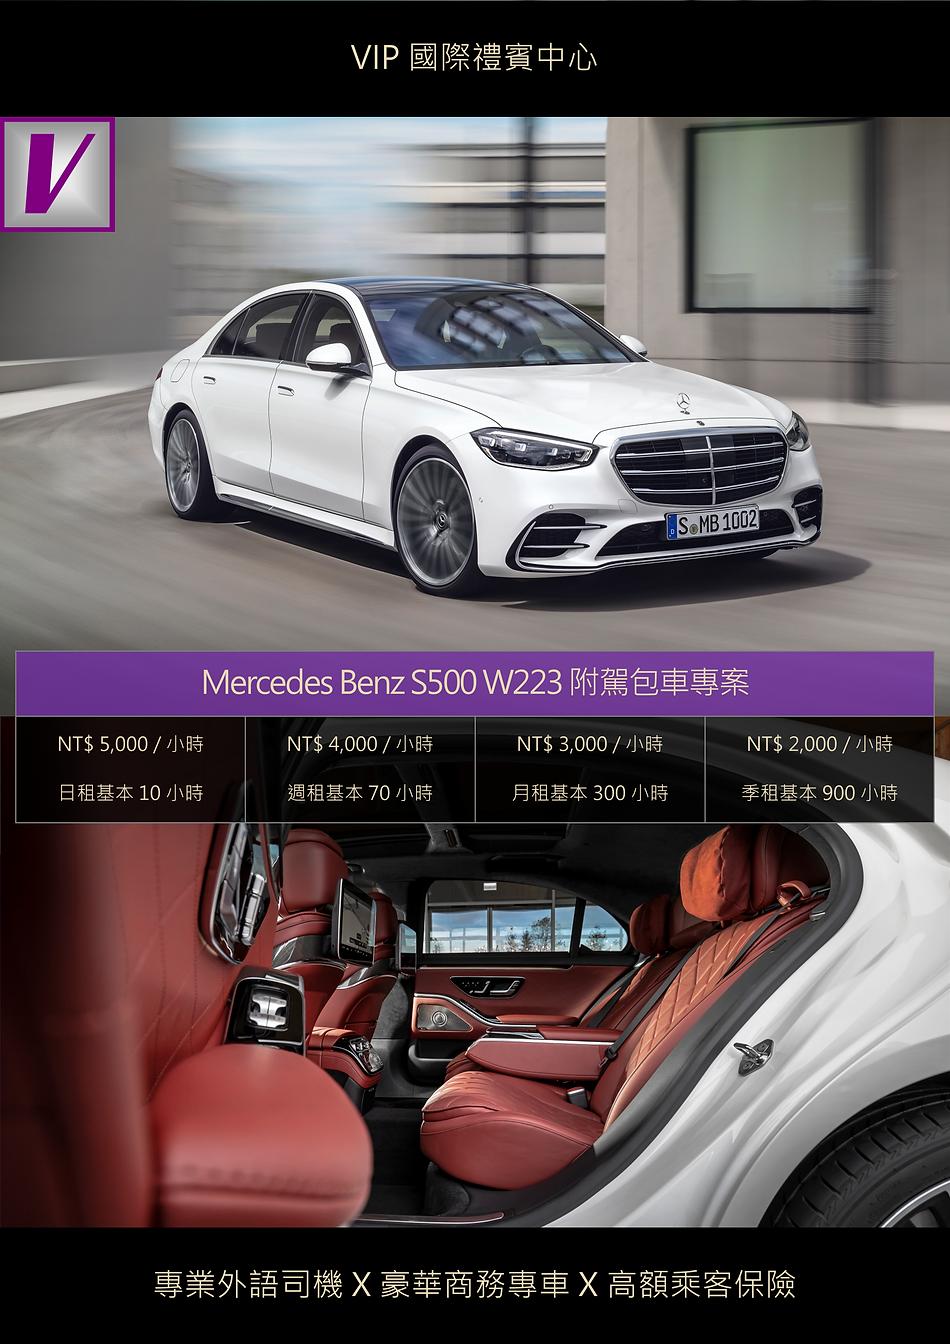 VIP國際禮賓中心 MERCEDES BENZ S500 W223 附駕包車專案 DM.png